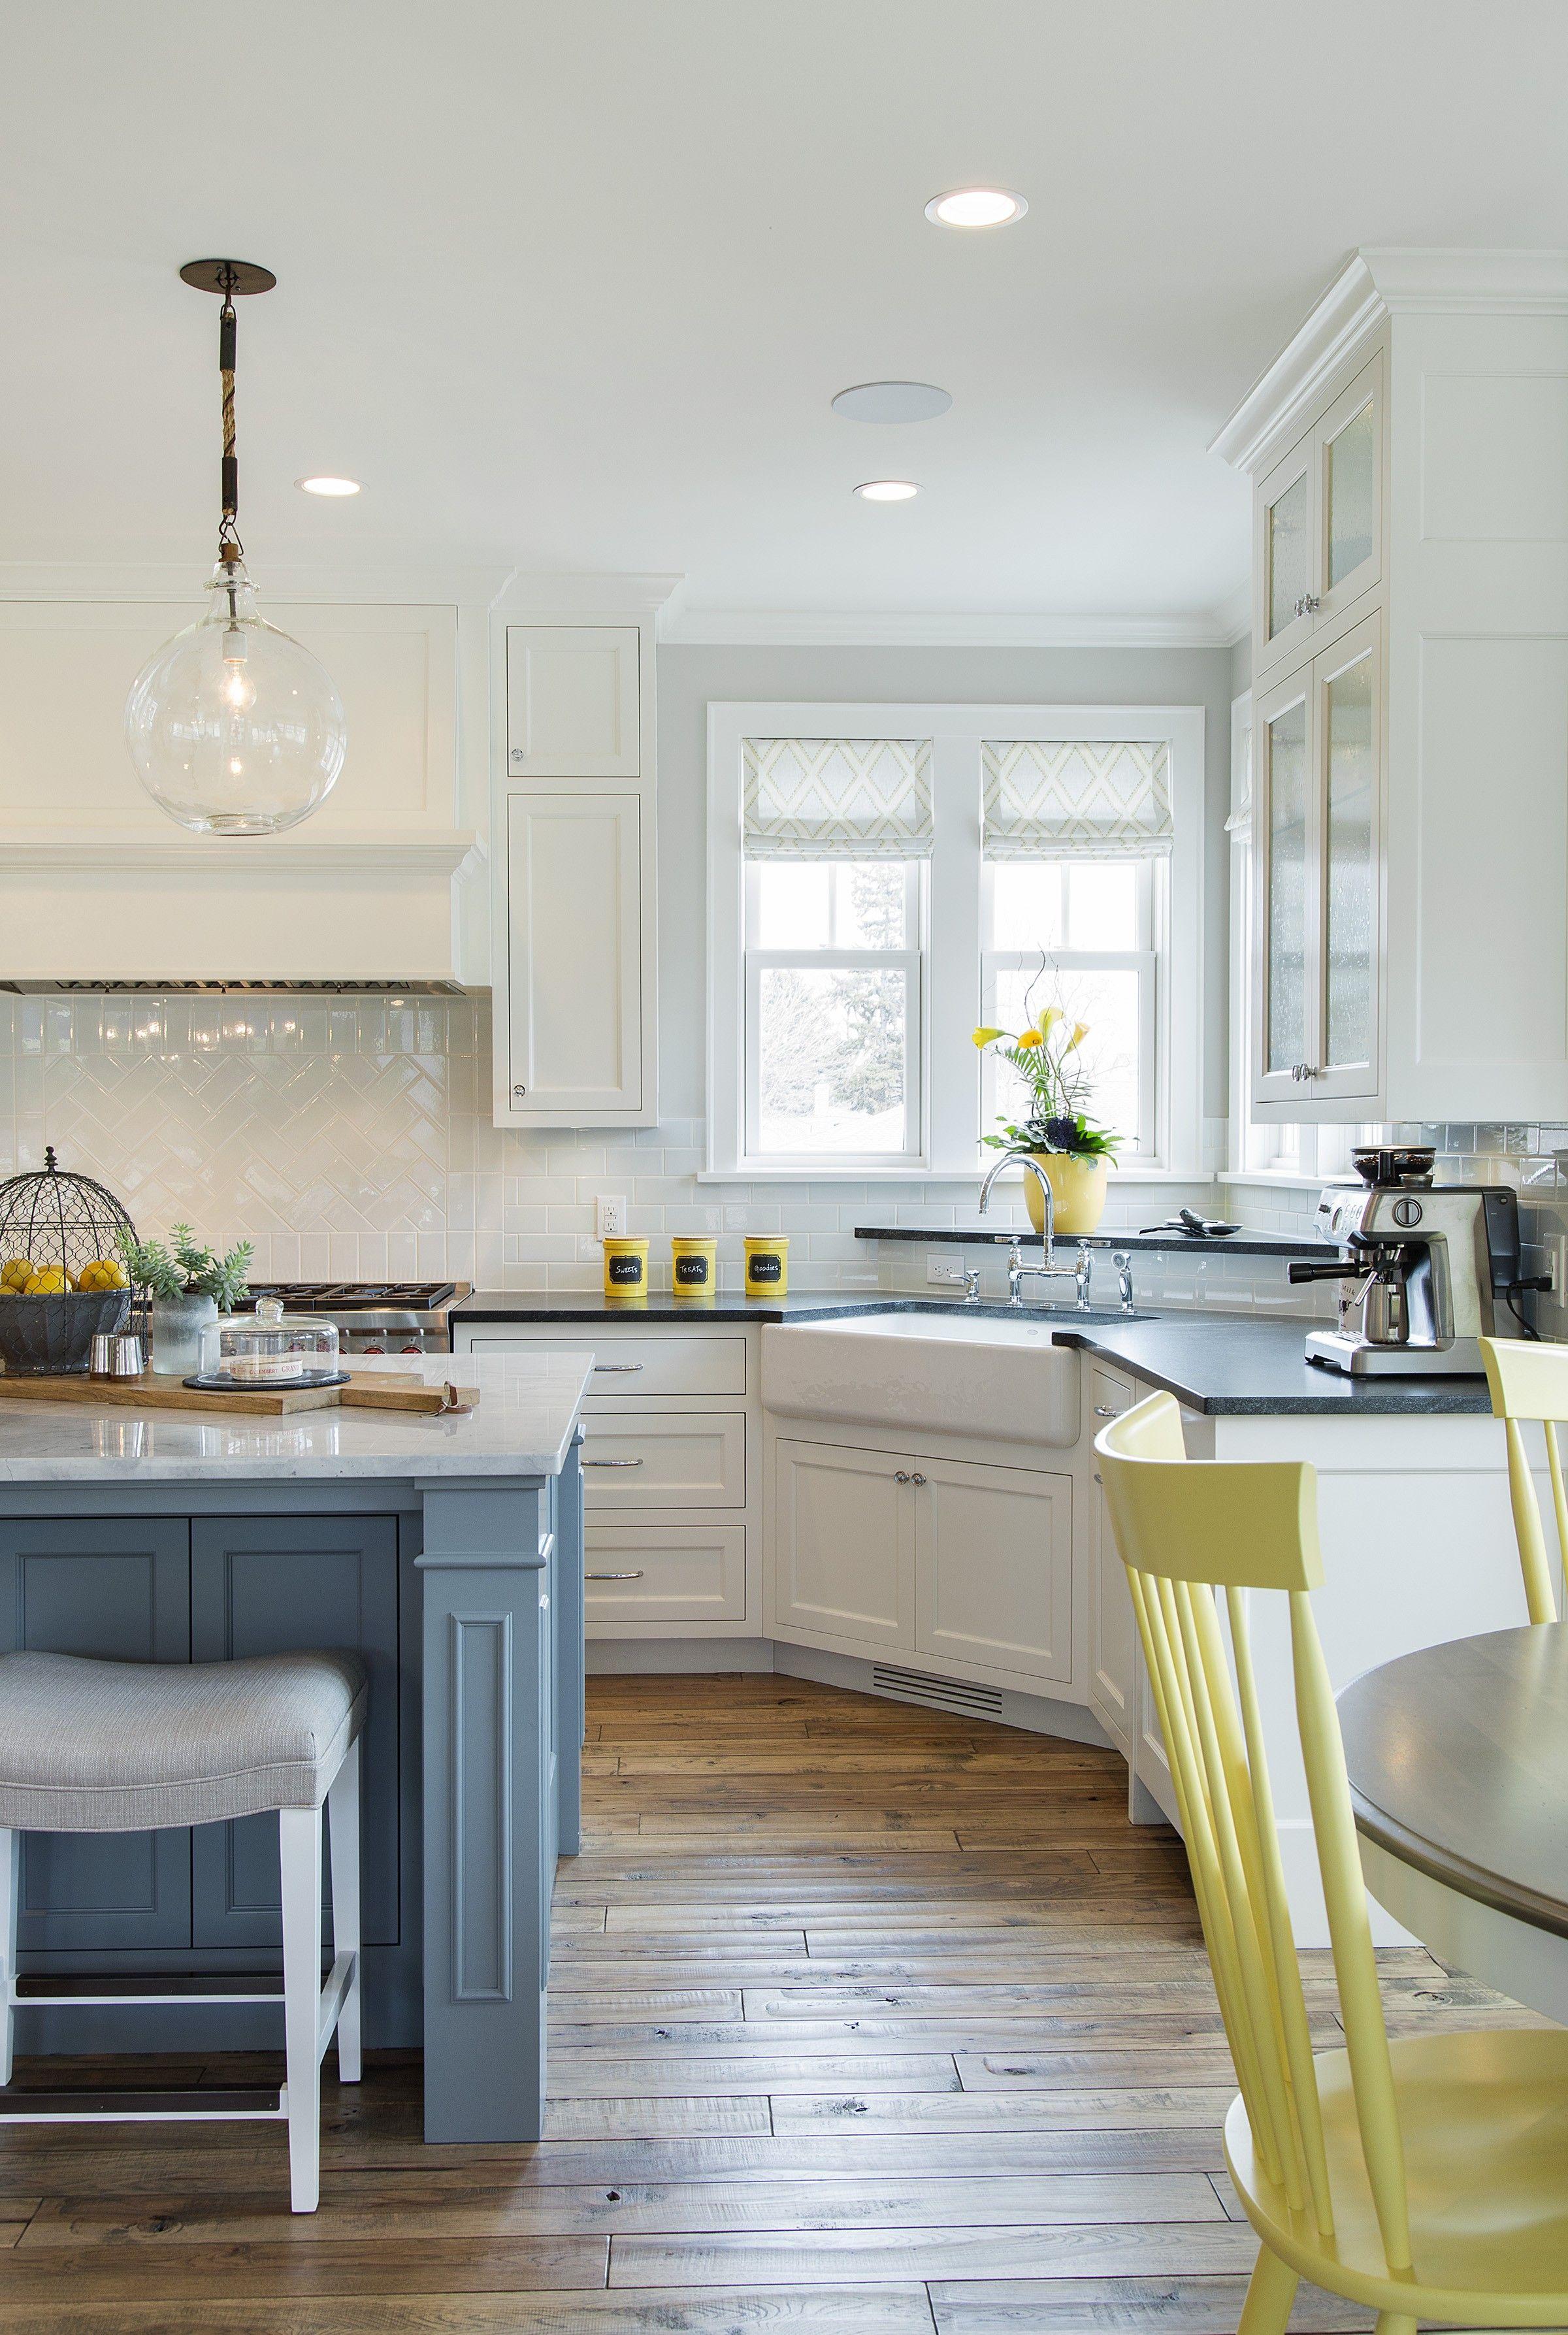 Great Neighborhood Homes - Custom Home Builder